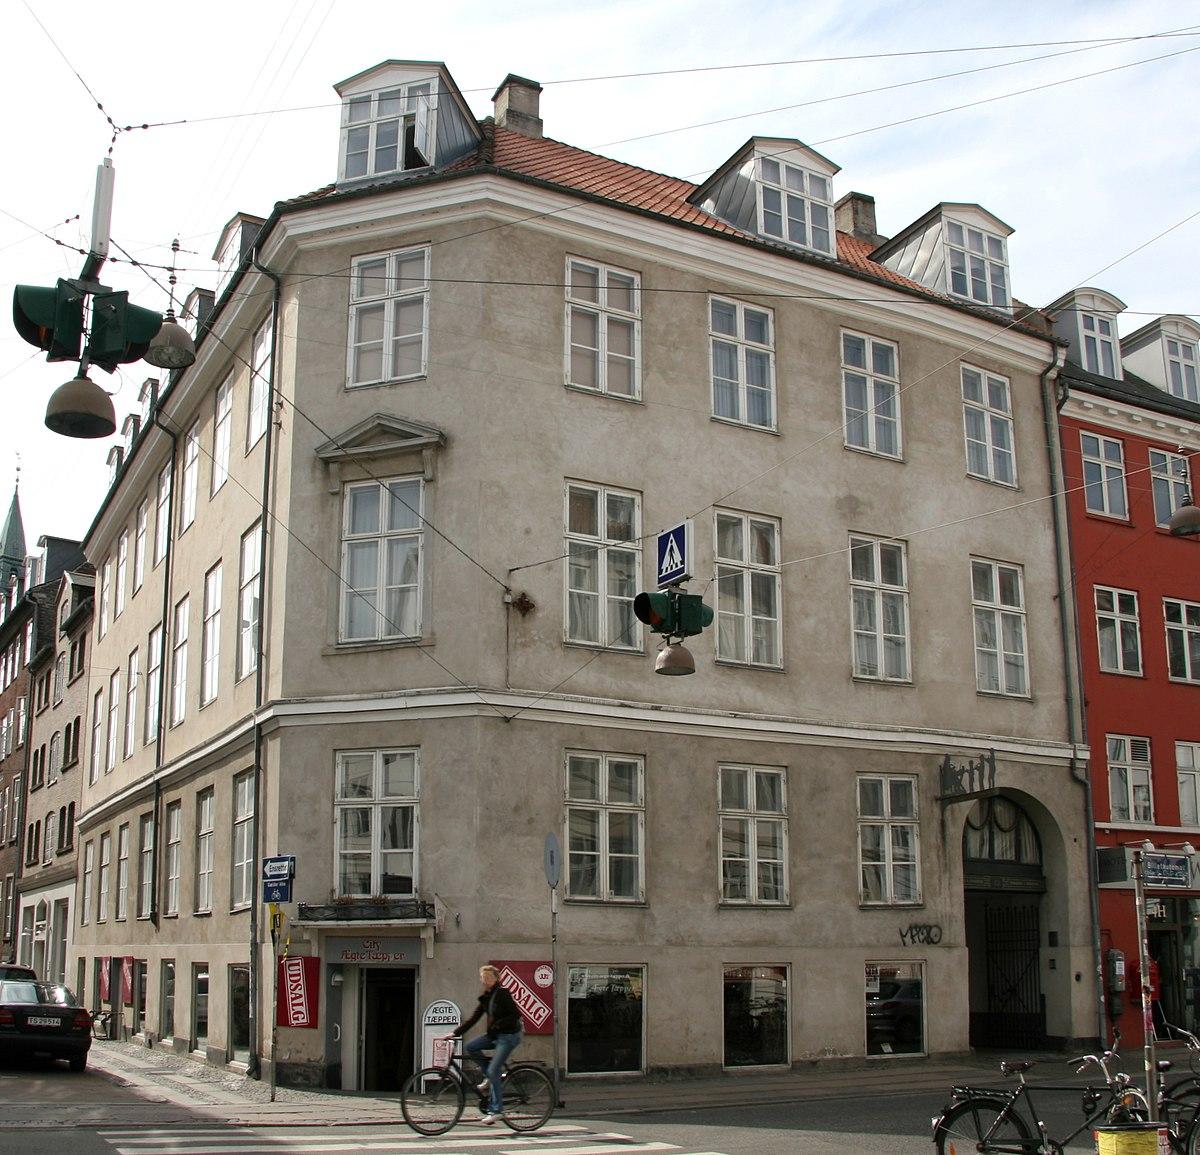 brugerservice Dansk landbrugs museum